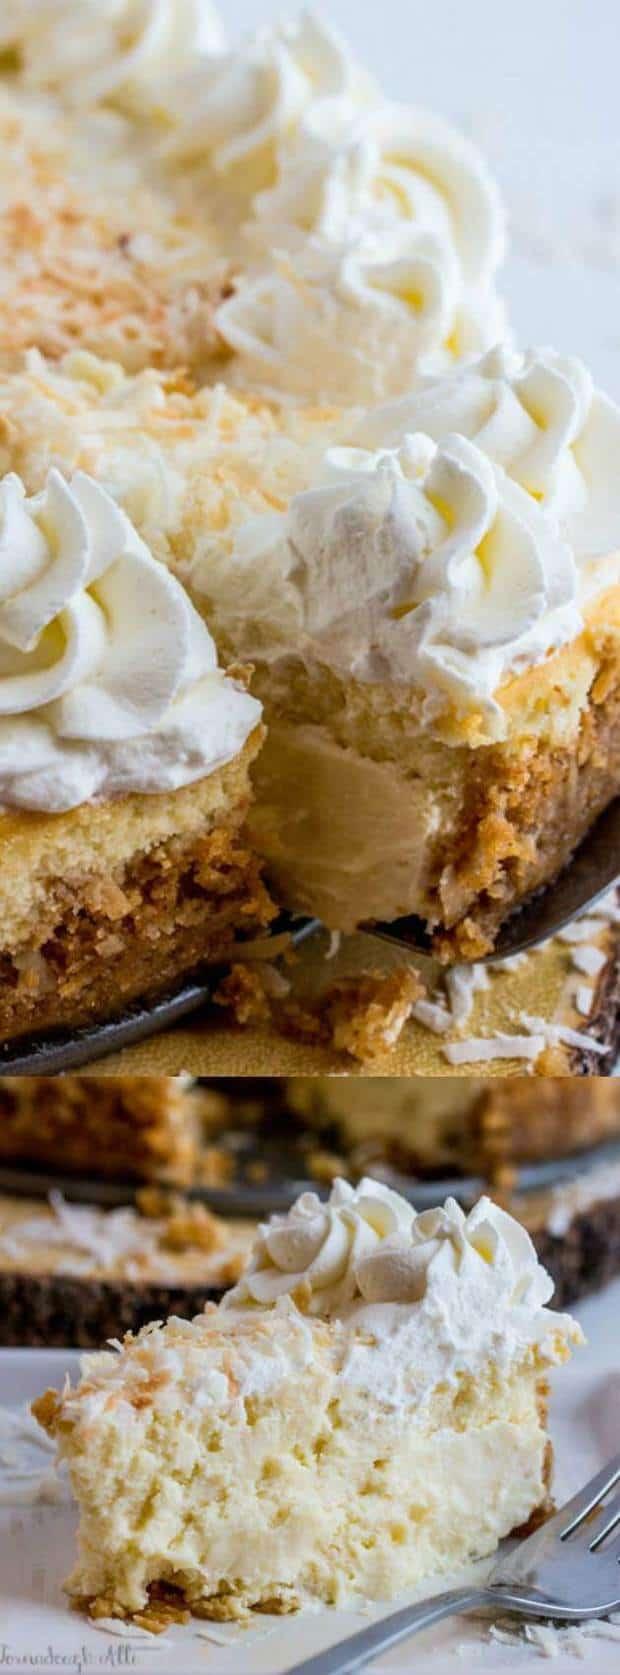 Coconut Cream Cheesecake Longpin